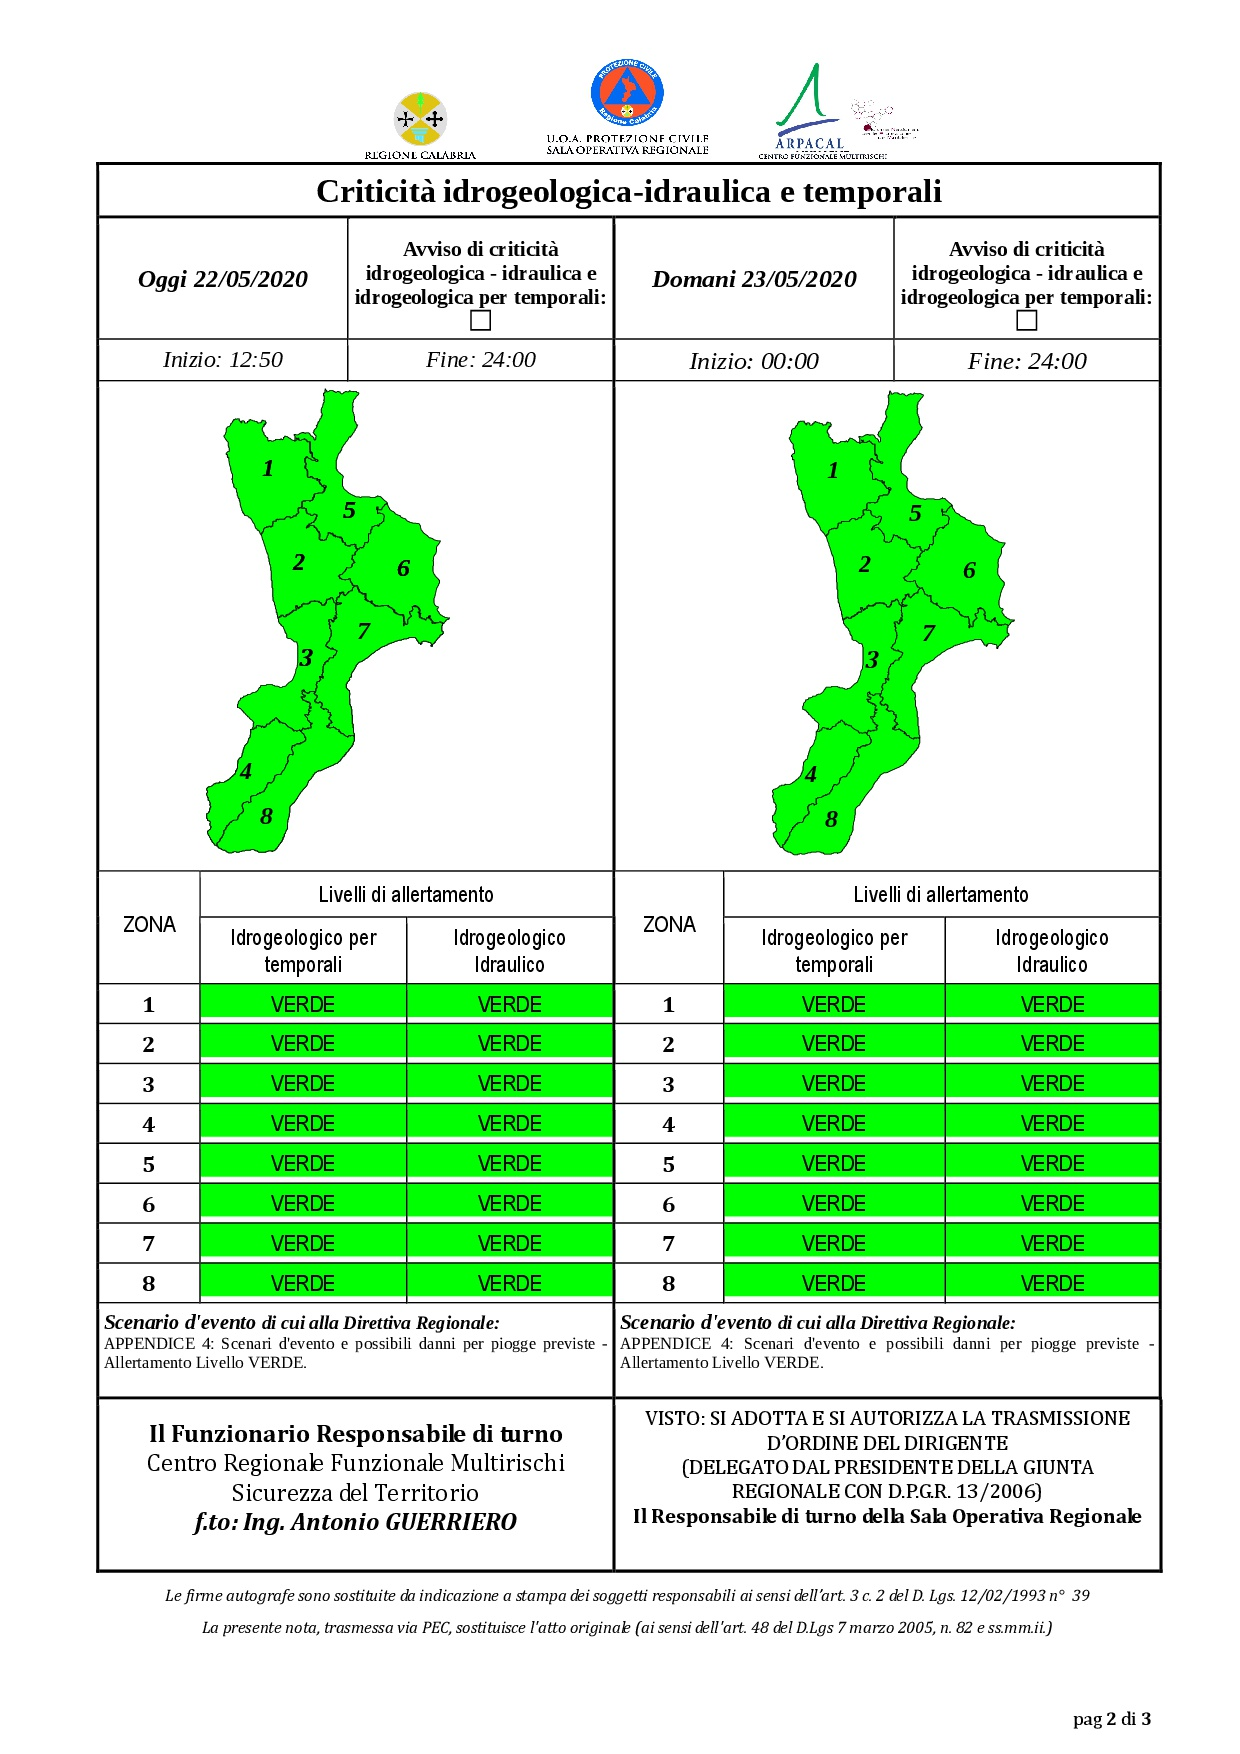 Criticità idrogeologica-idraulica e temporali in Calabria 22-05-2020